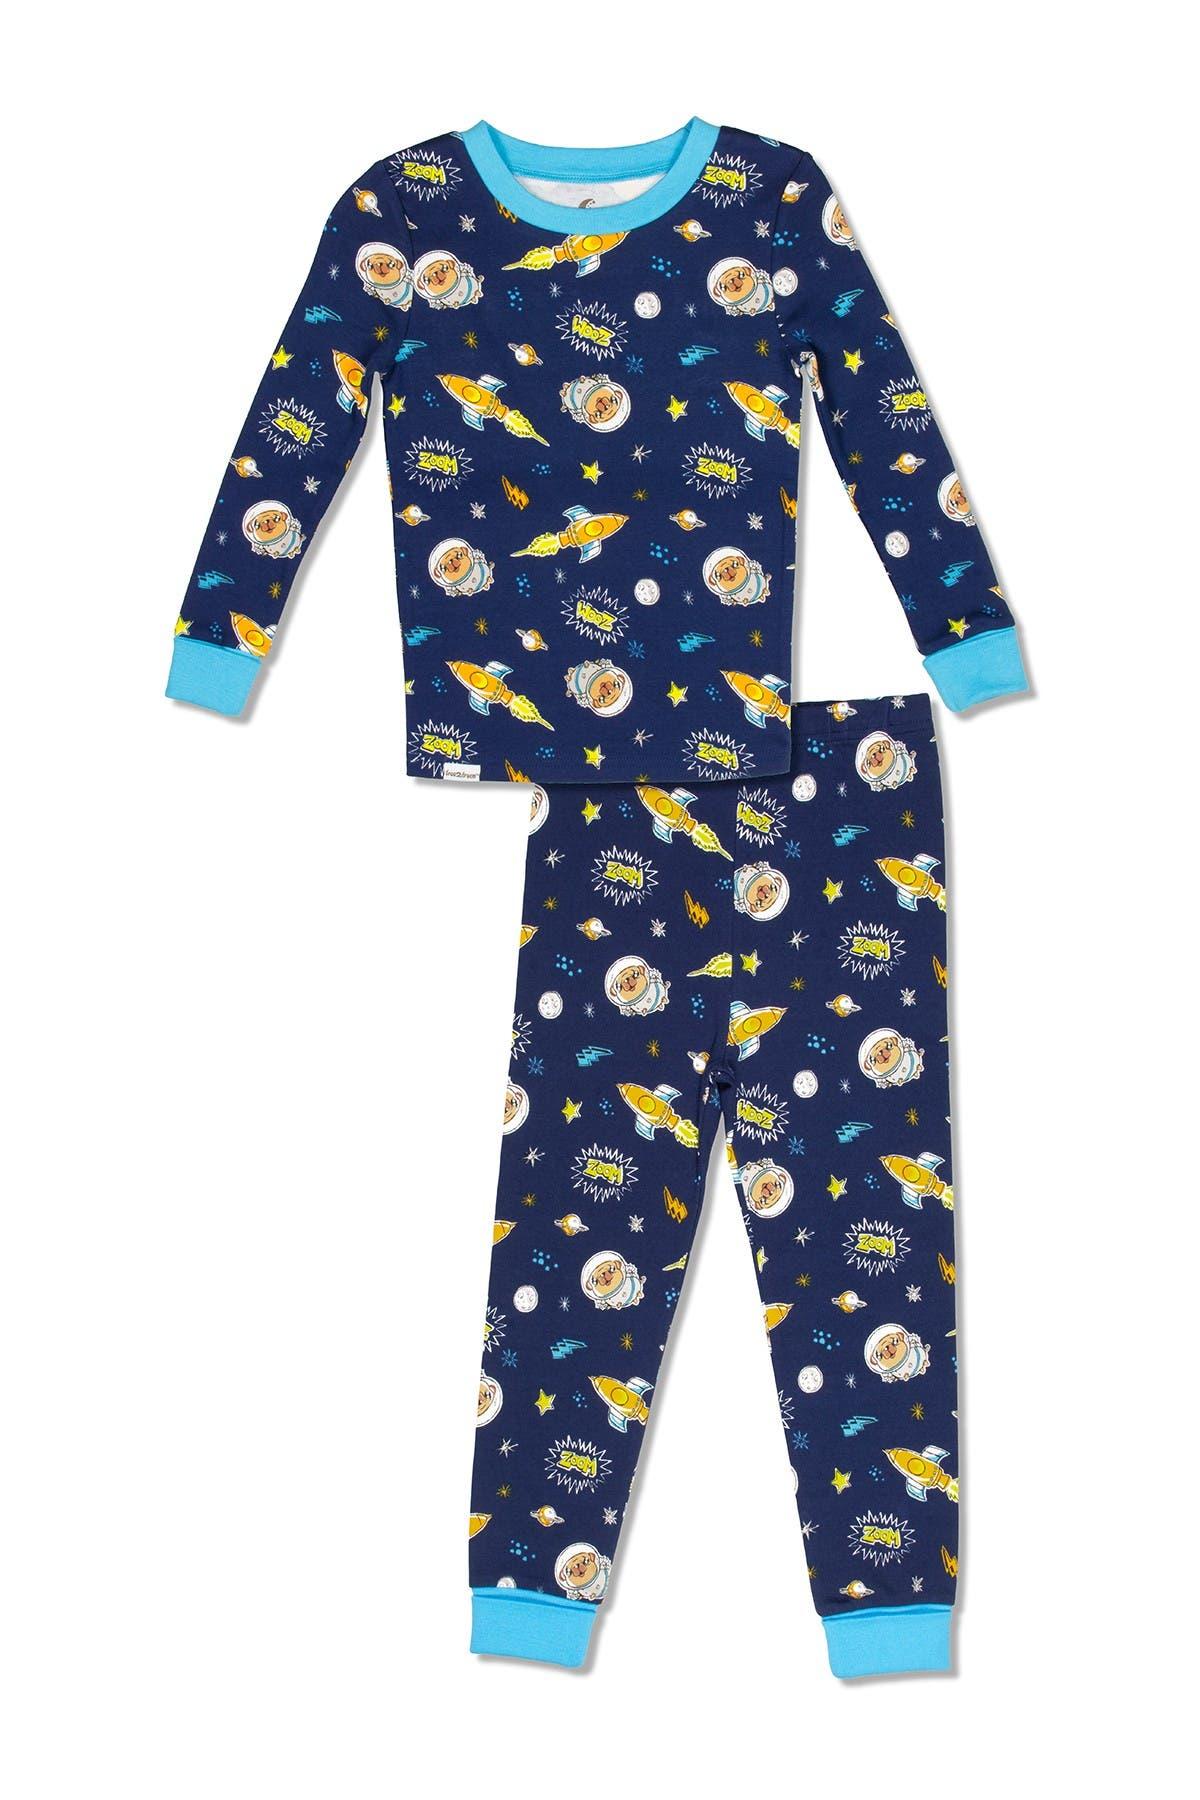 Image of SGI Apparel Free 2 Dream Space Print Pajama 2-Piece Set